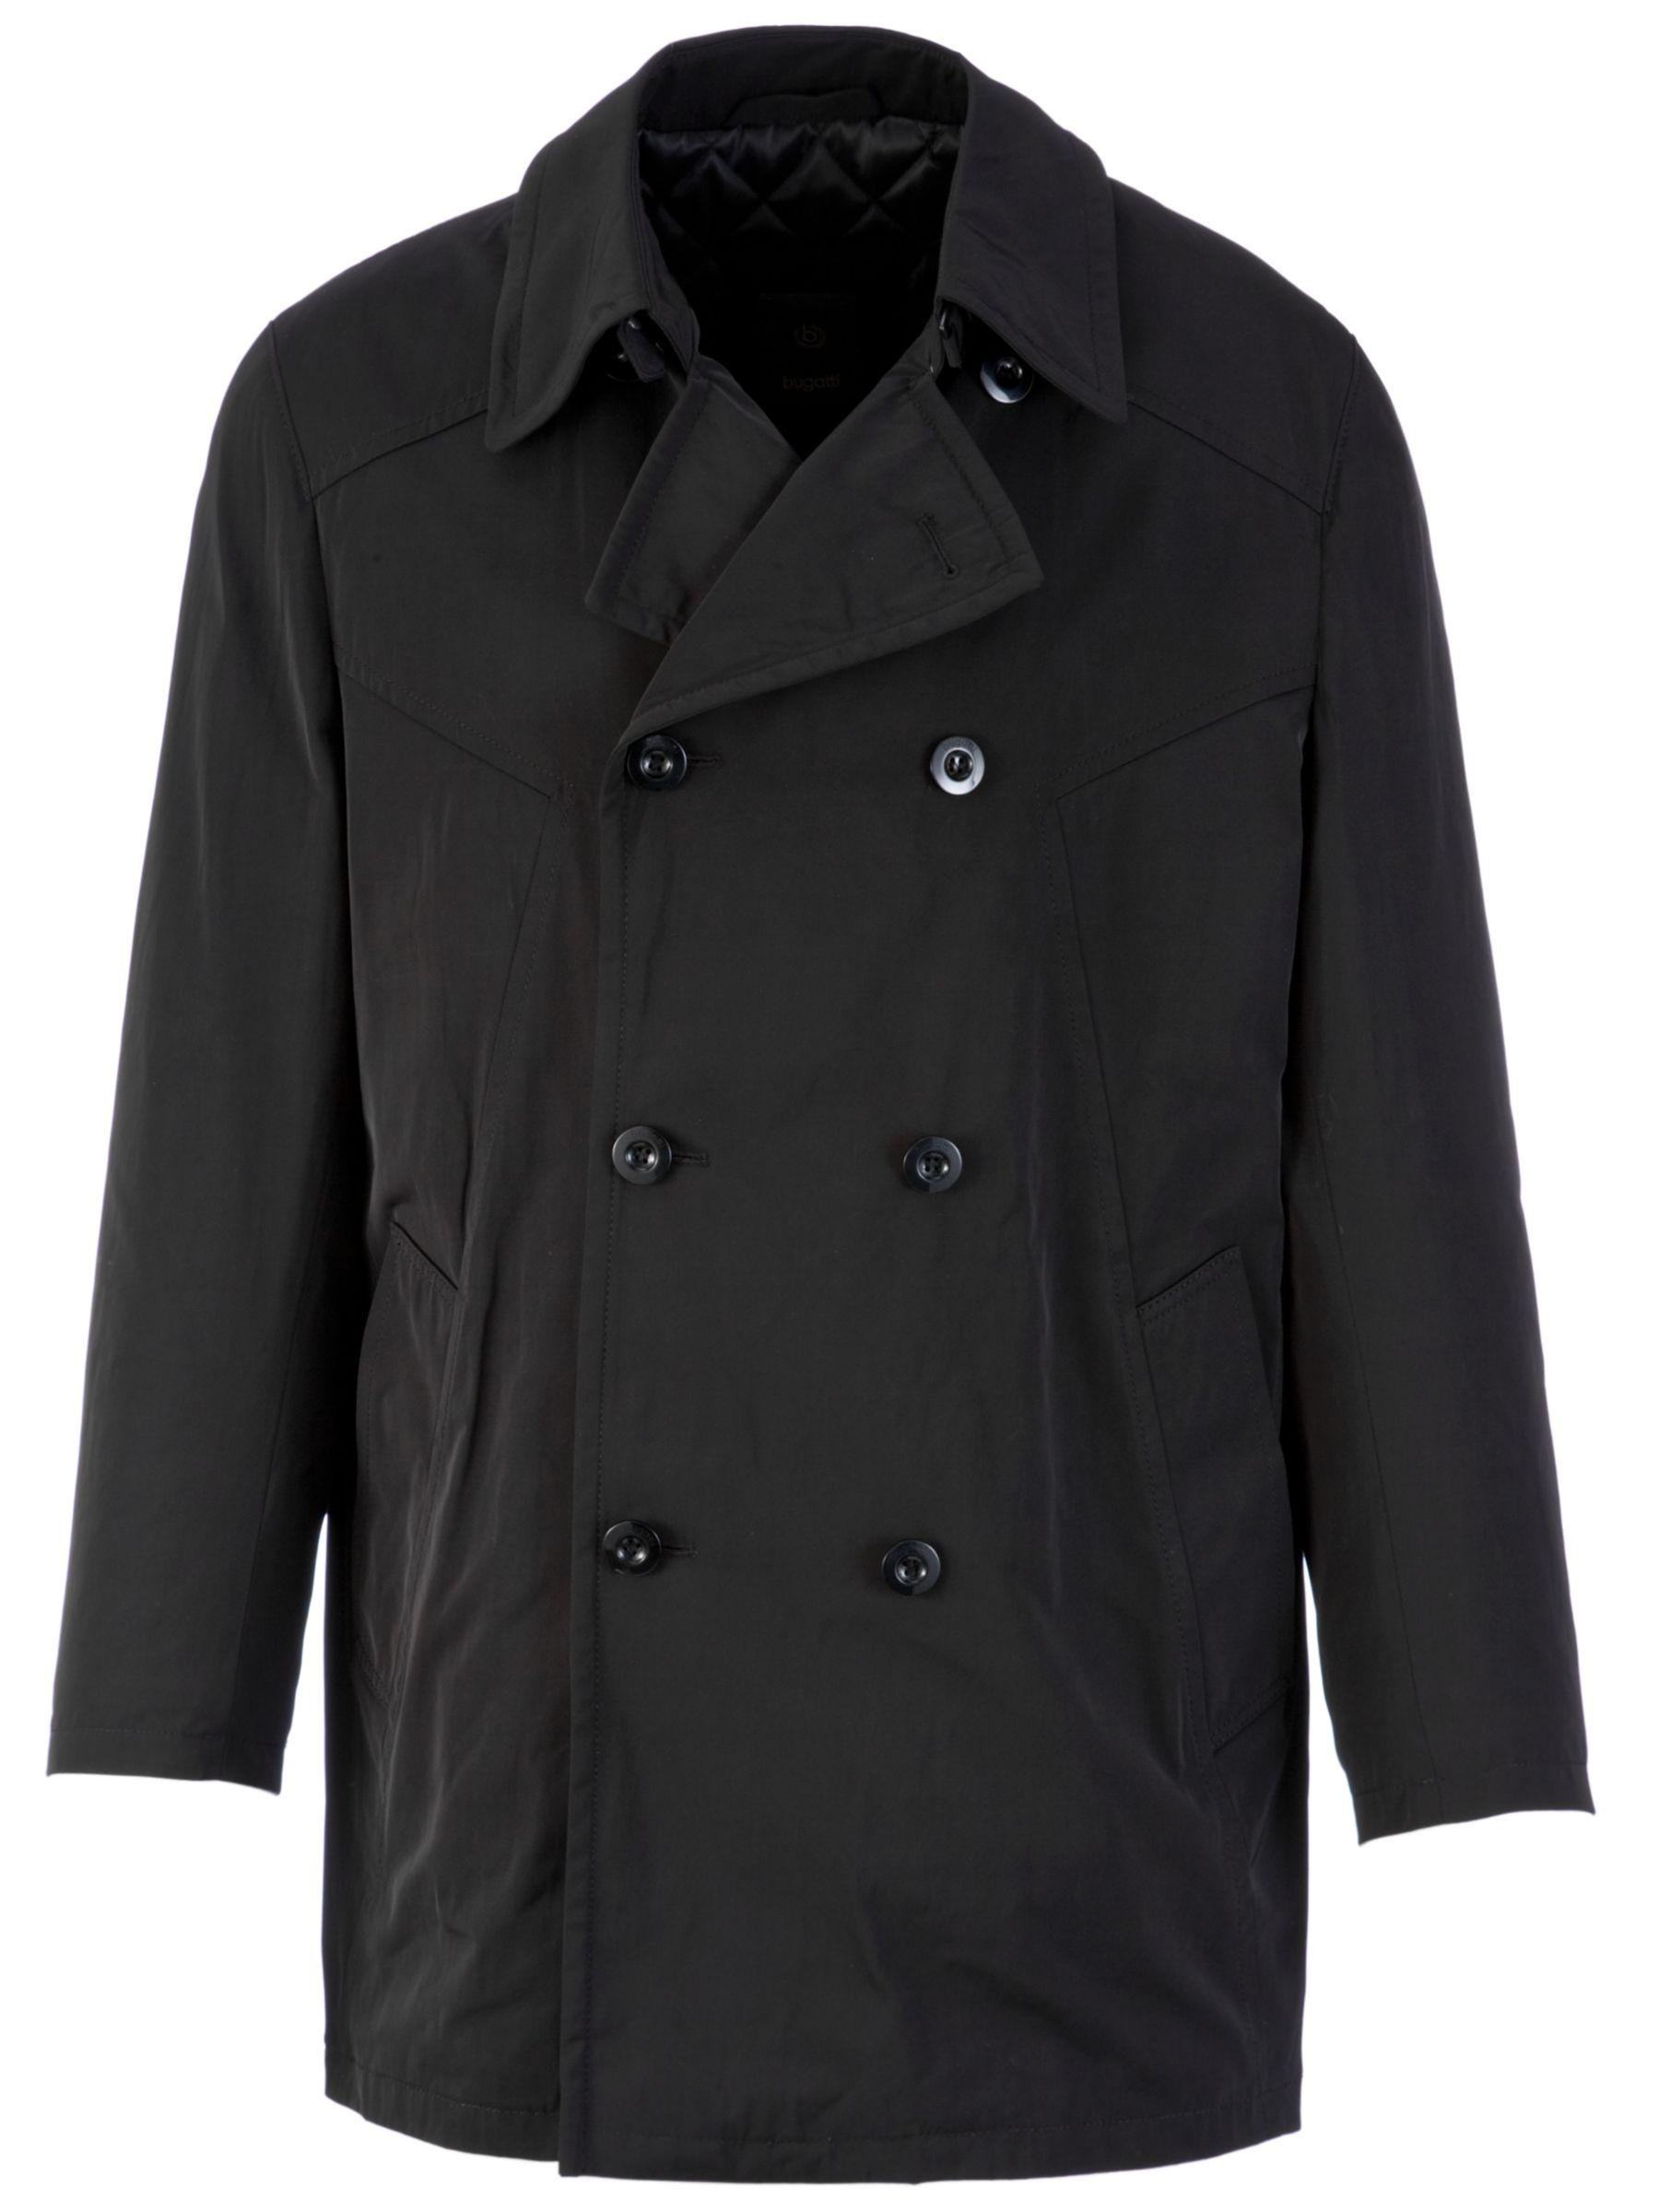 Bugatti Fashion Trench Coat, Black at John Lewis